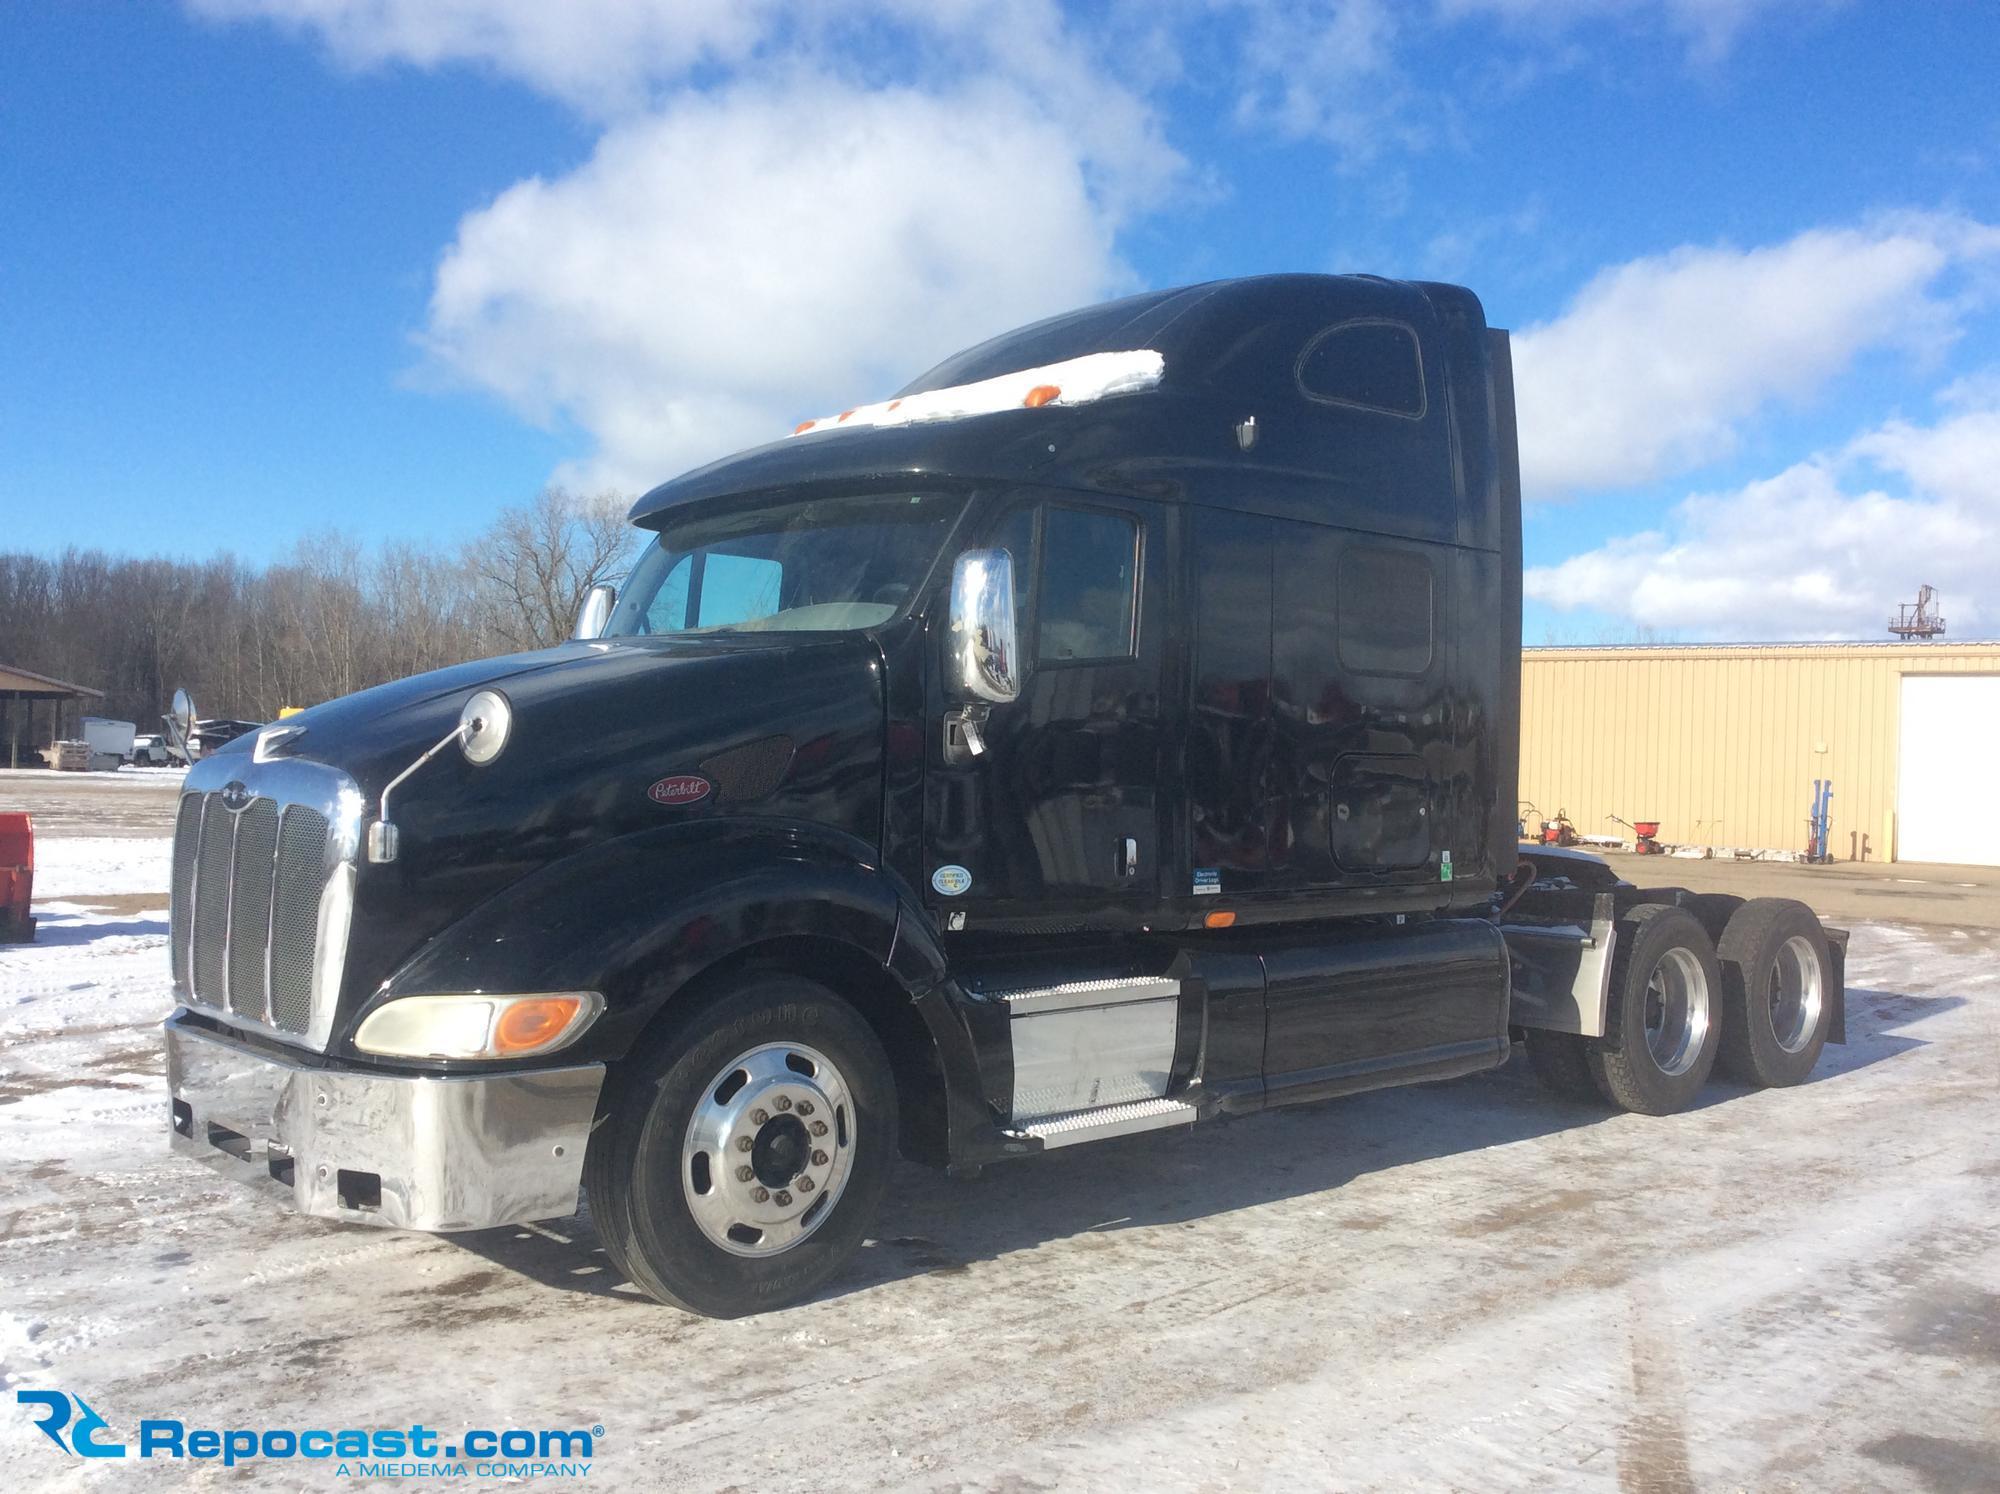 Semi-trailer truck - Wikipedia